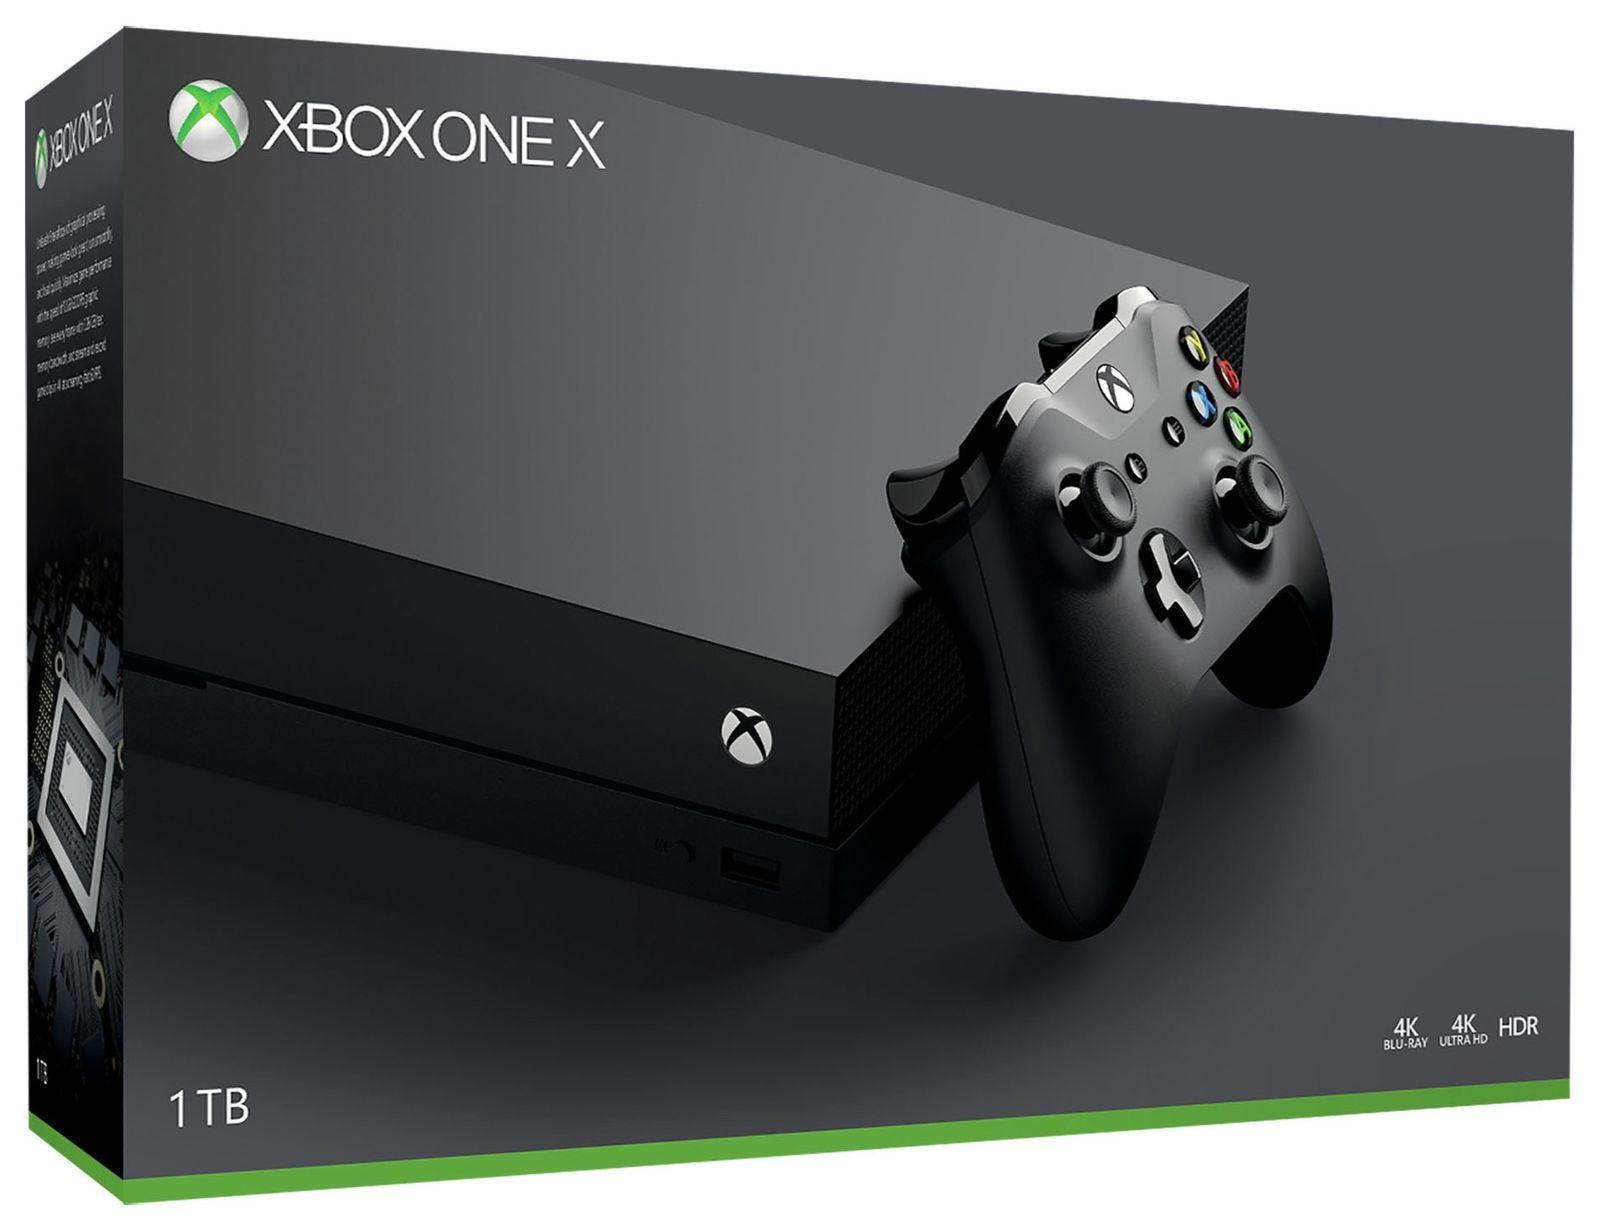 Refurbished Microsoft Xbox One X 1TB 4K Gaming Console - Black, £303.99 at Argos/ebay